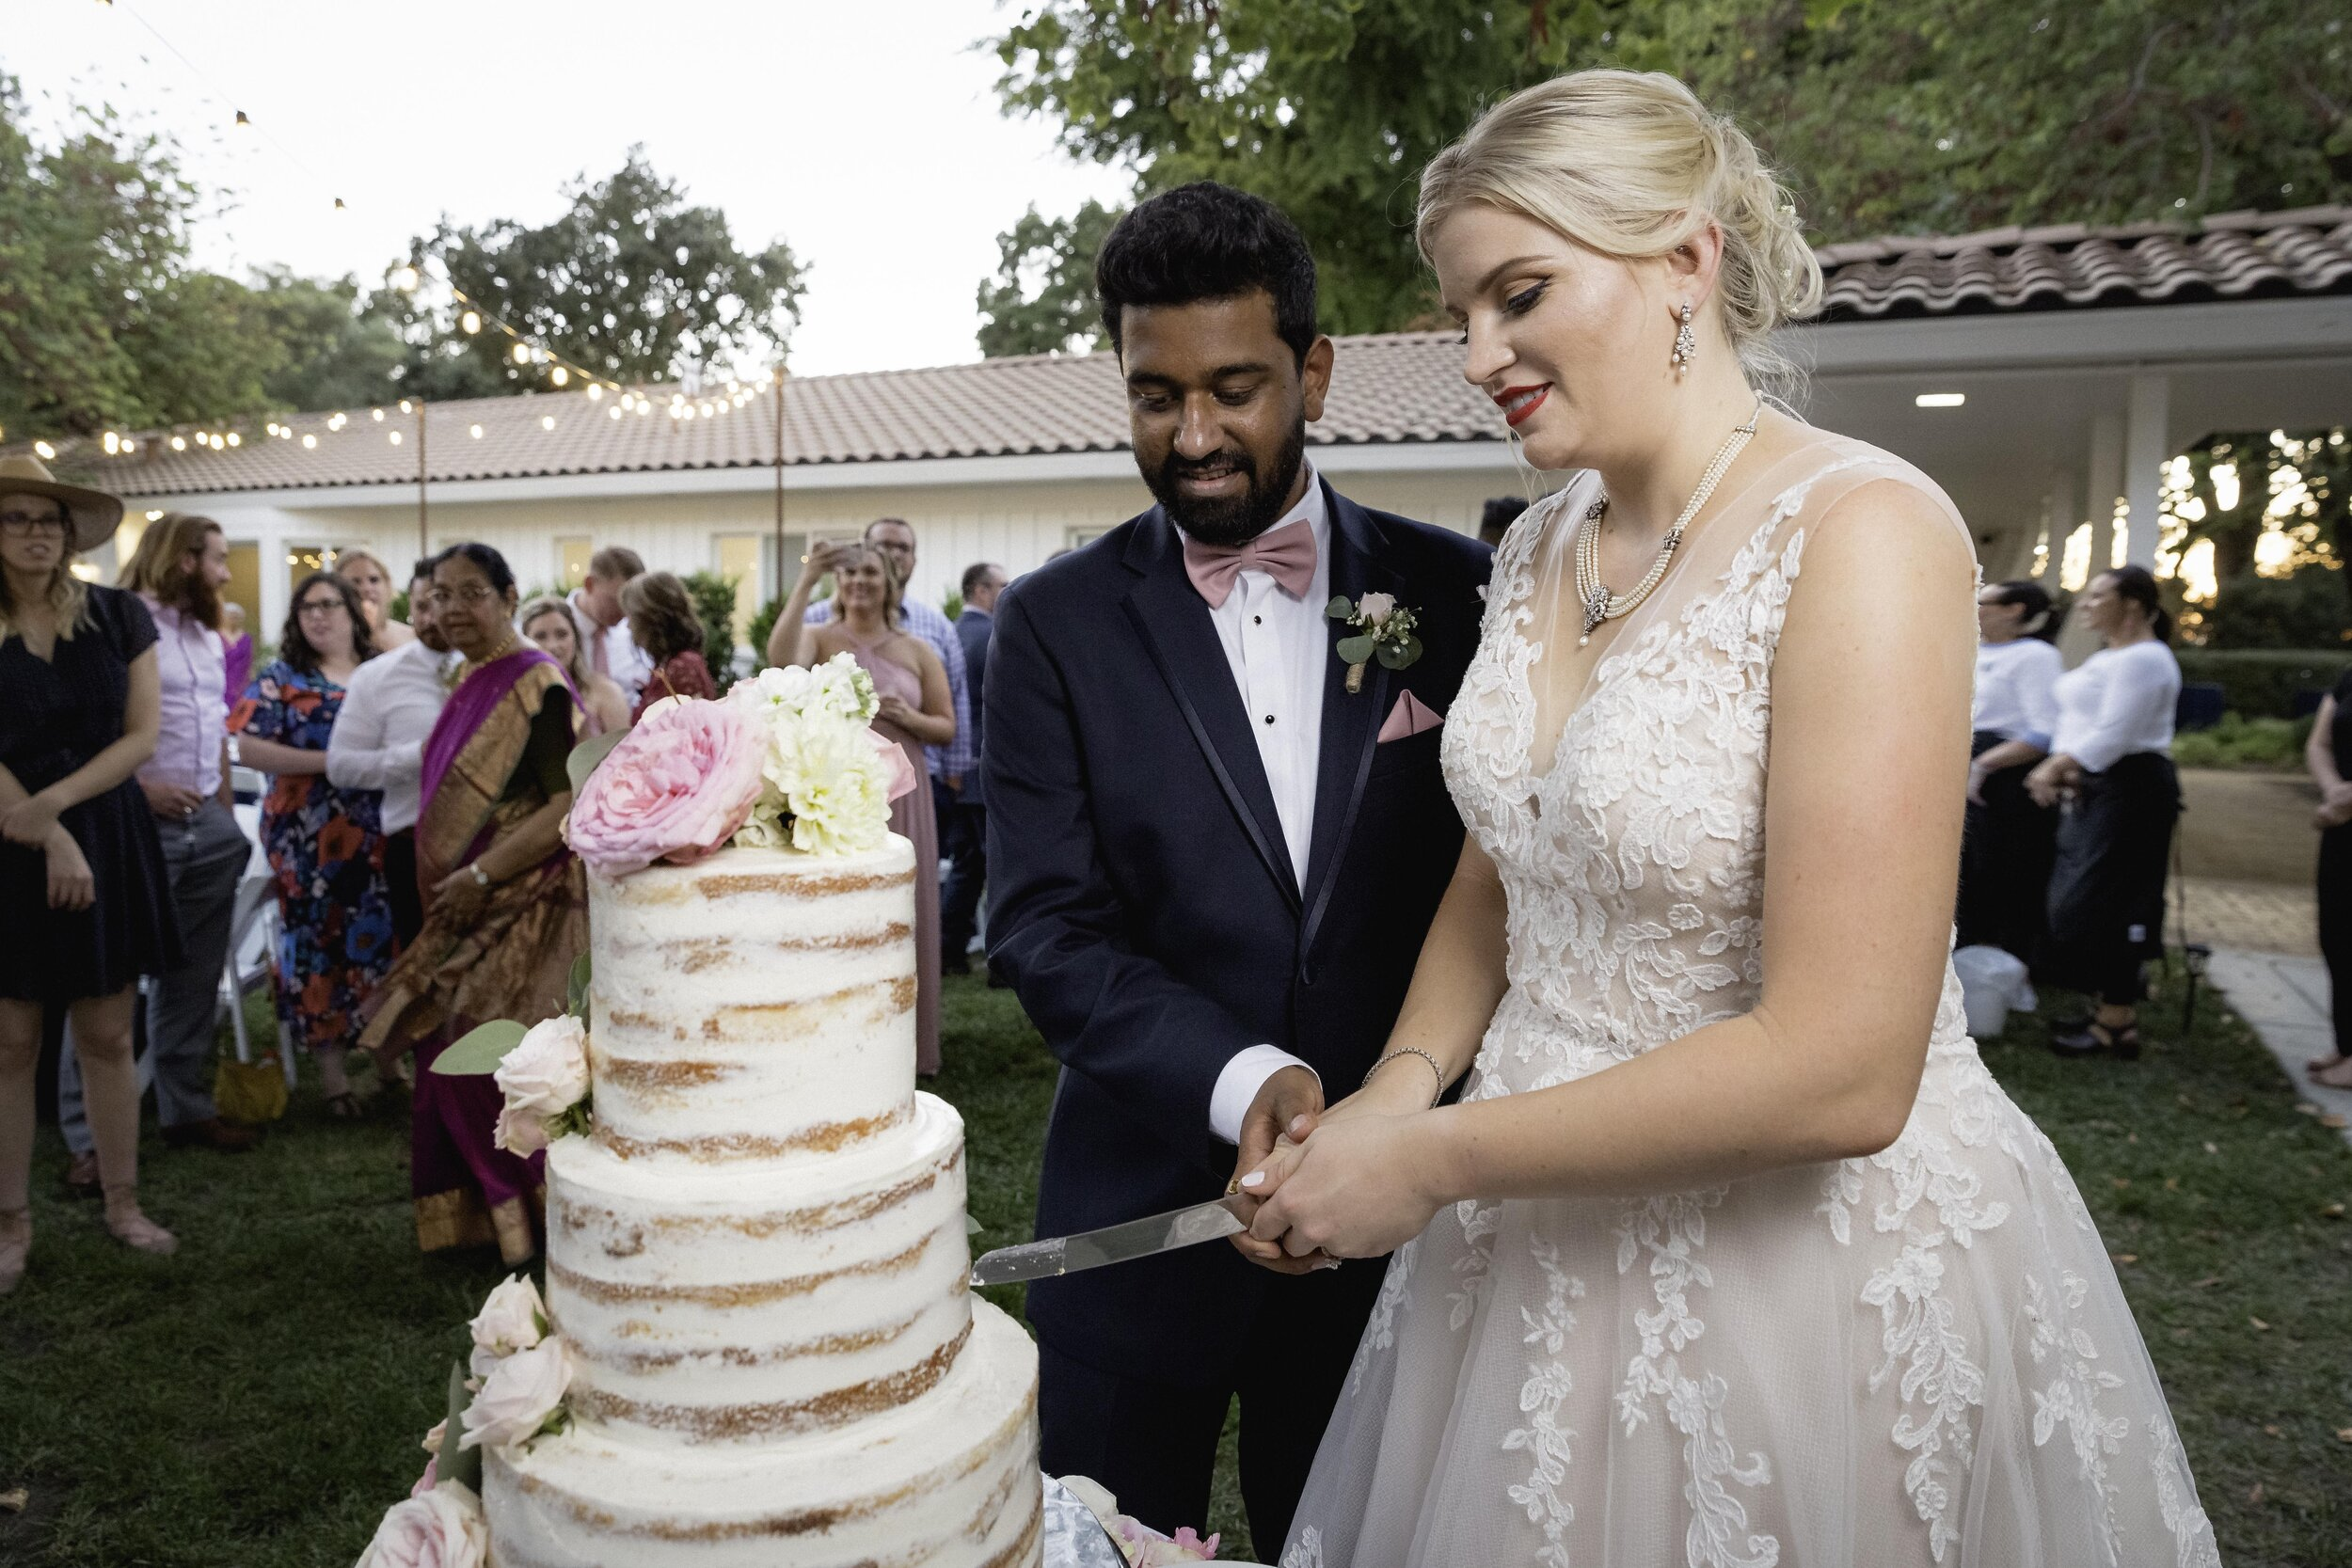 2019.08.24_Emily-Ashir-Wedding-at-the-Maples-6325.jpg